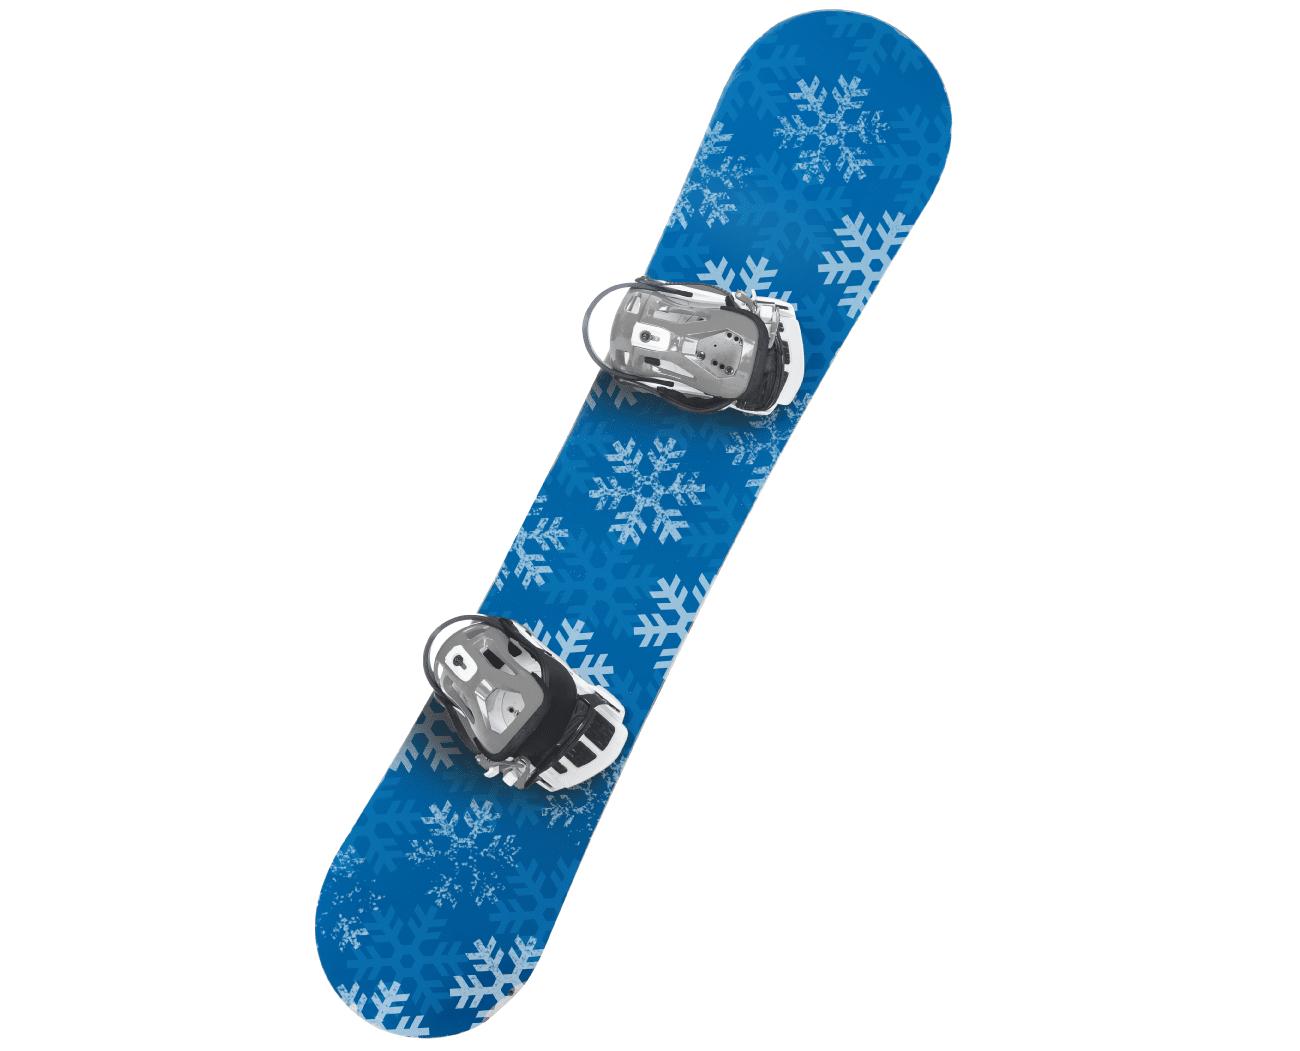 snowboardSQ